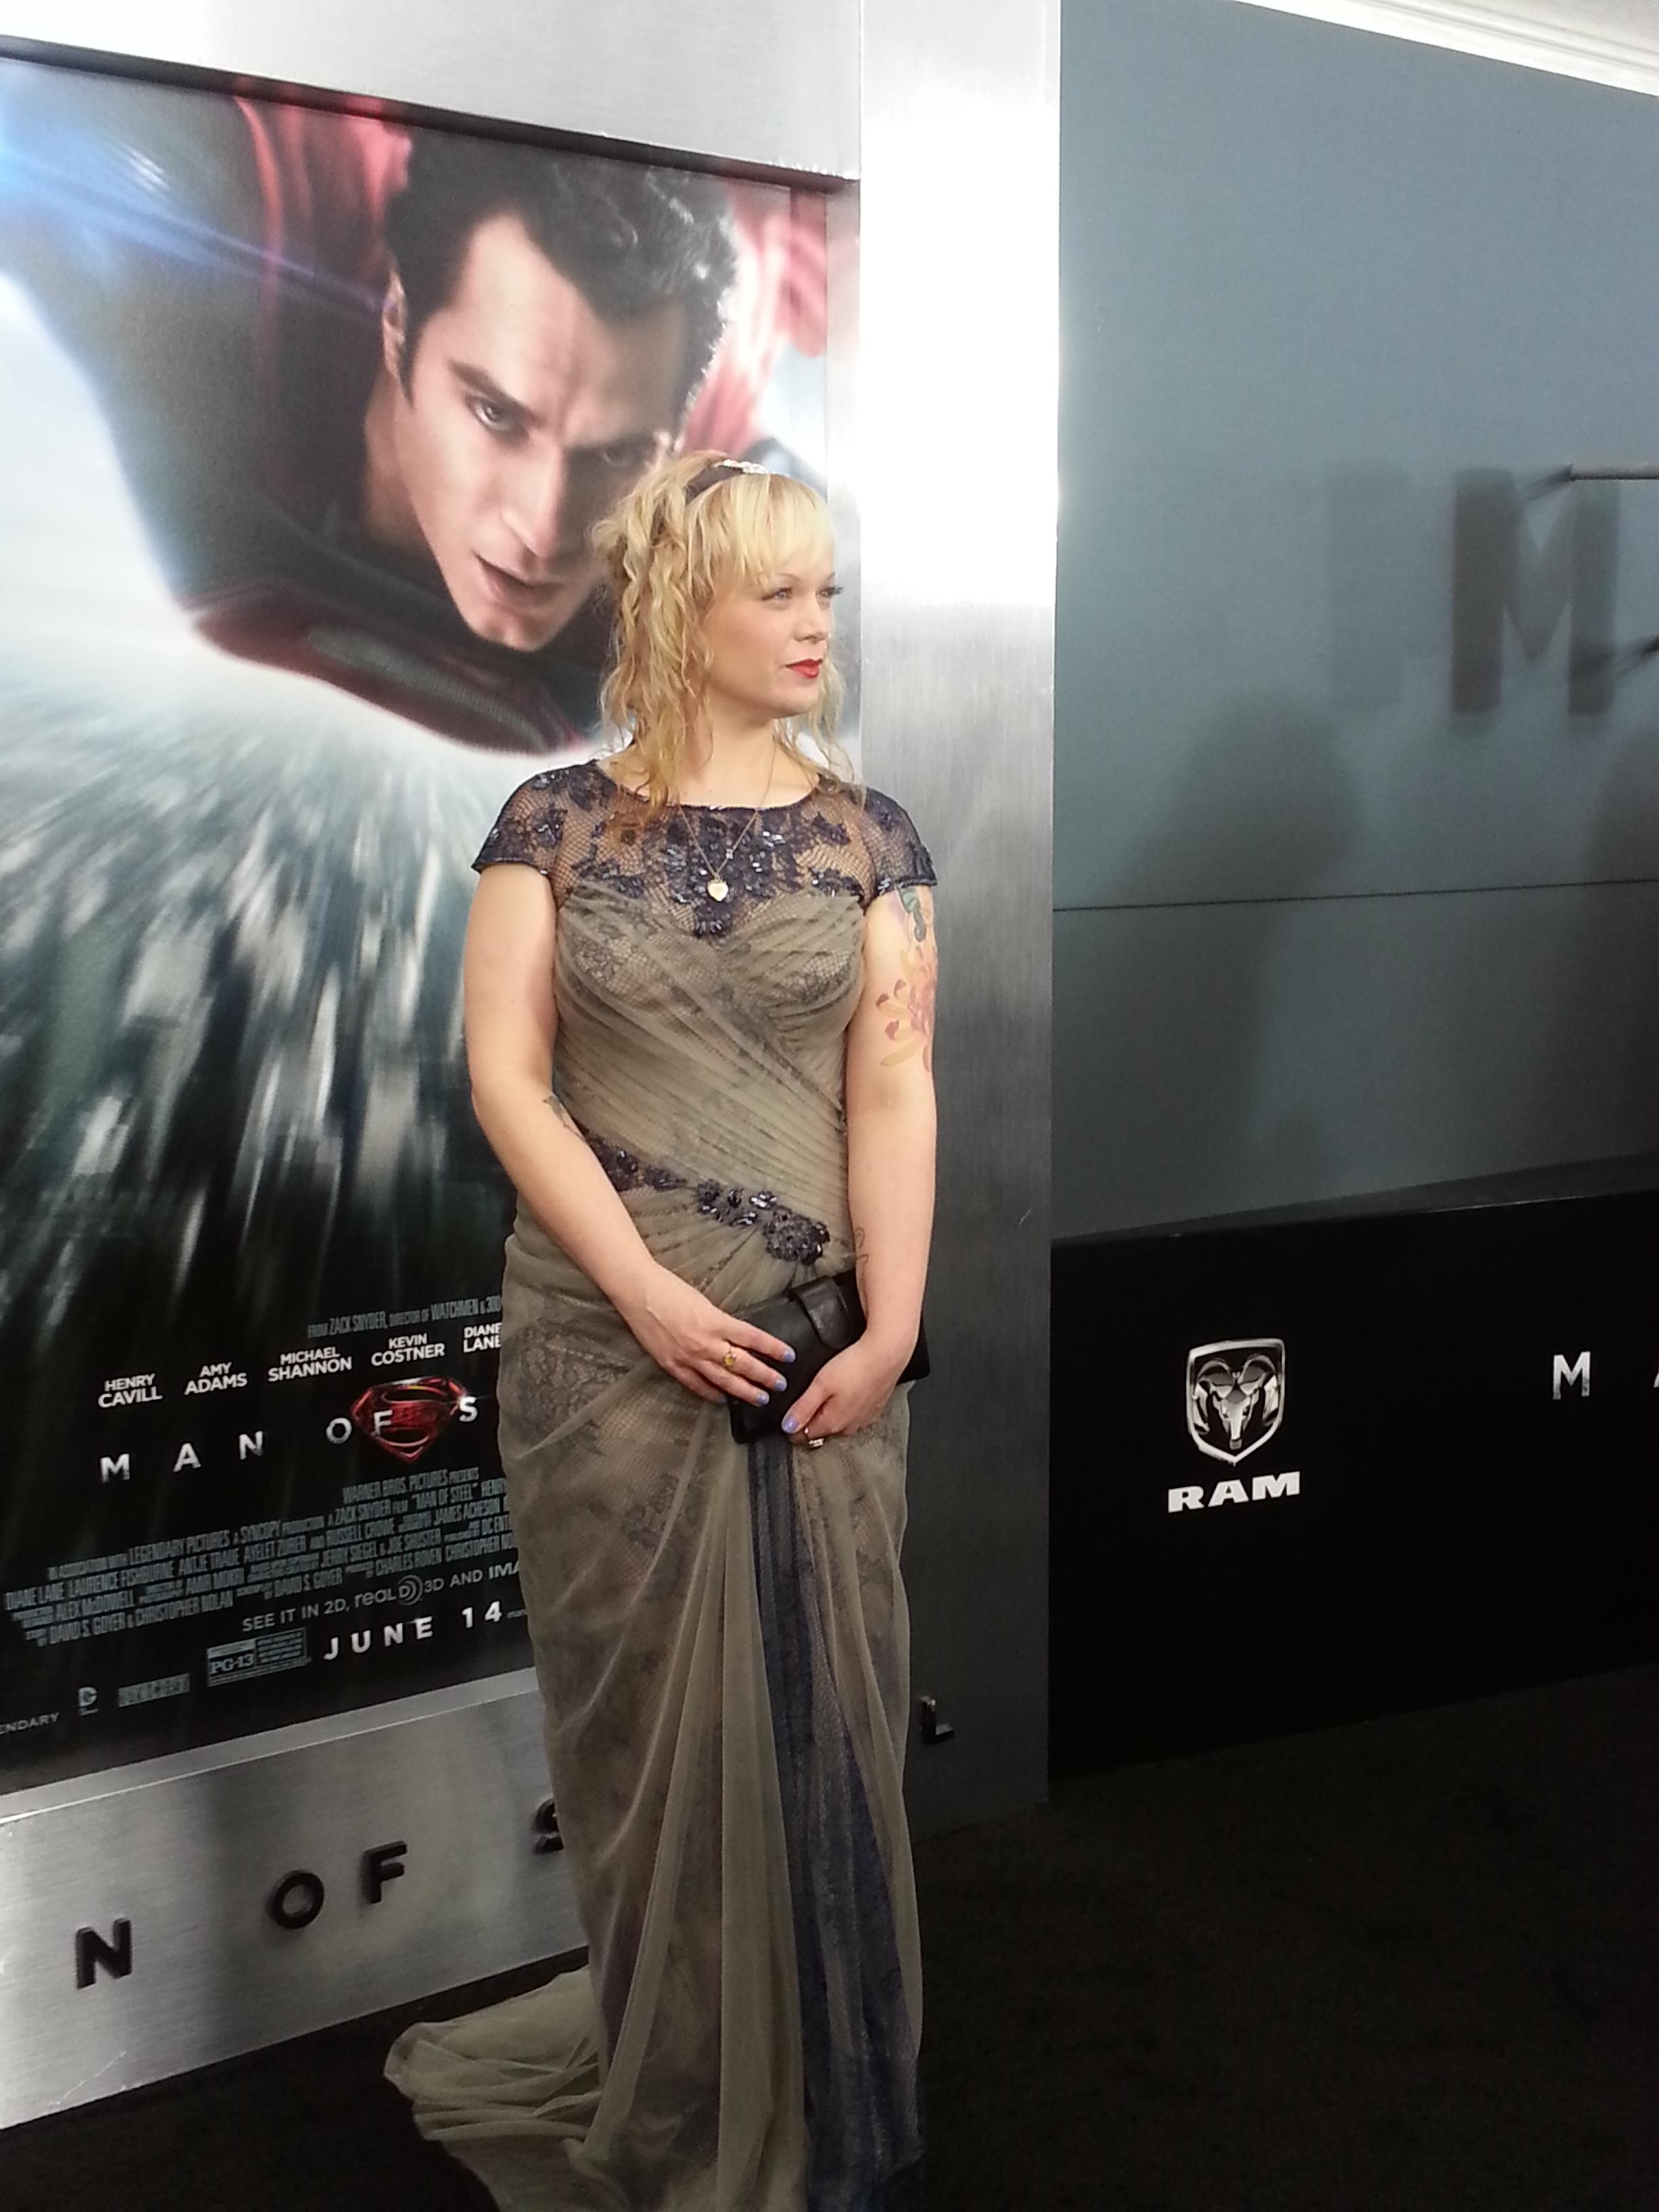 Allison Crowe - Man of Steel World Premiere, New York City